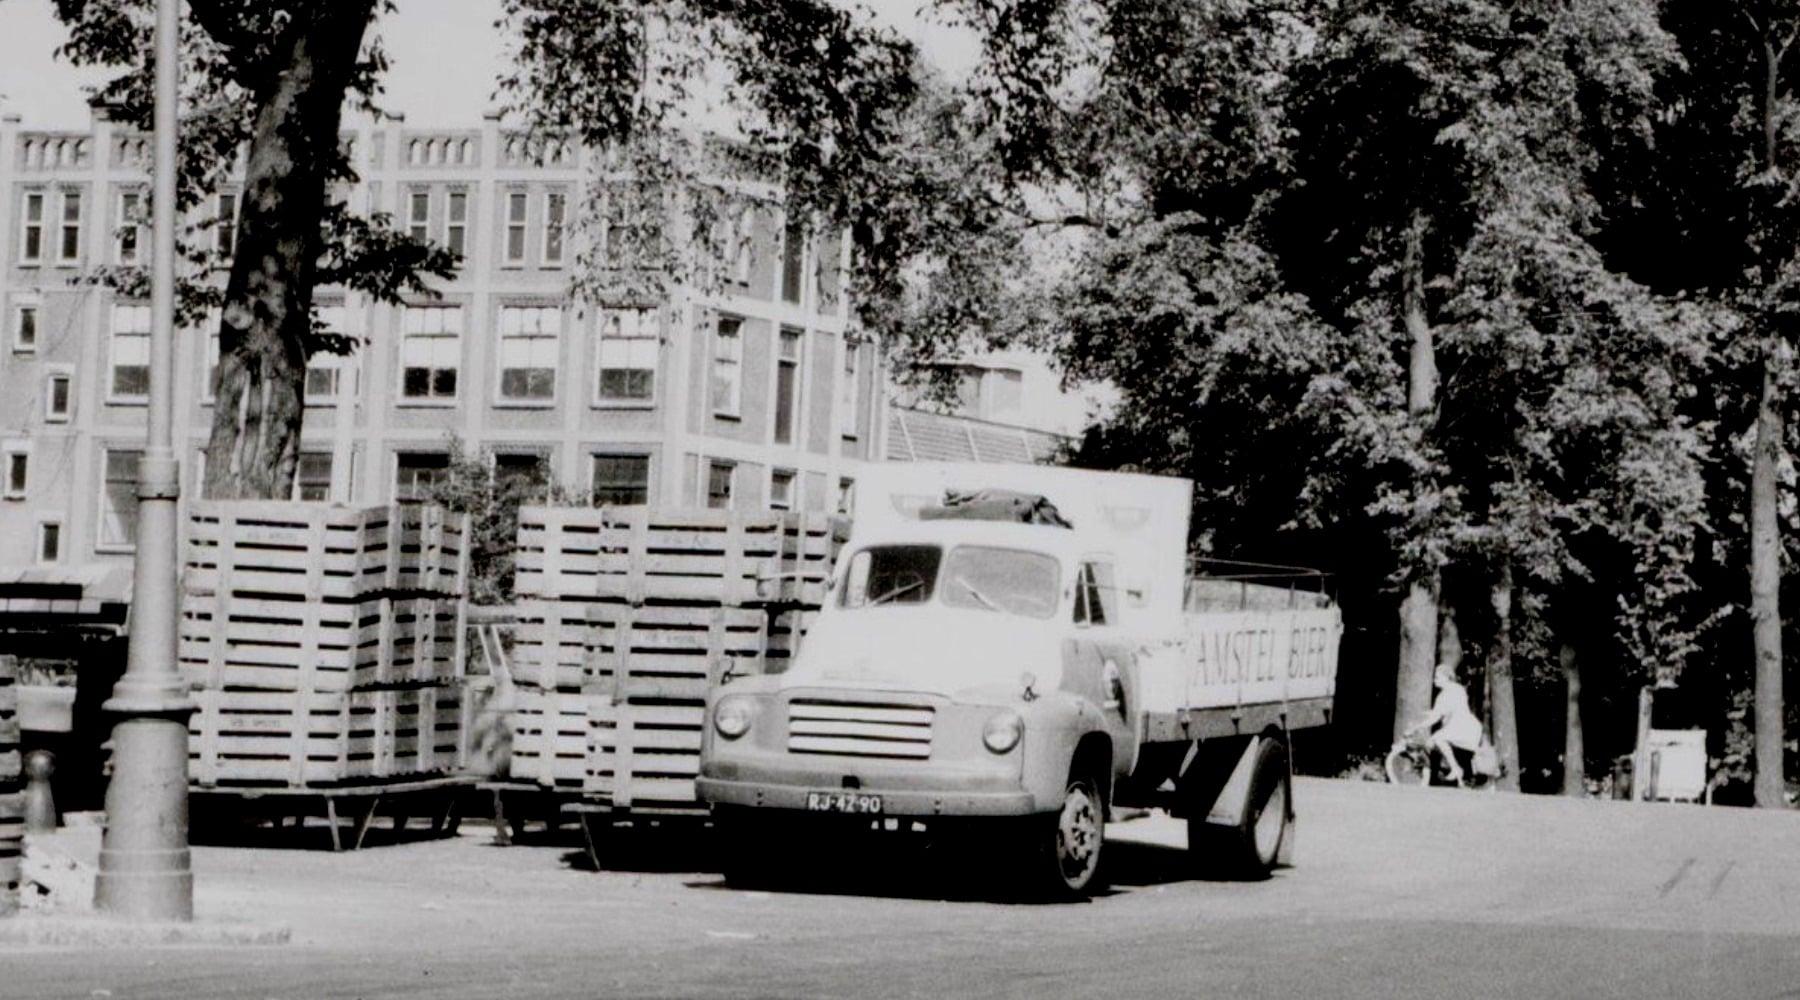 Amsterdam-Mauritskade-Amstel-Brouwerij-Bedford-A-1966---